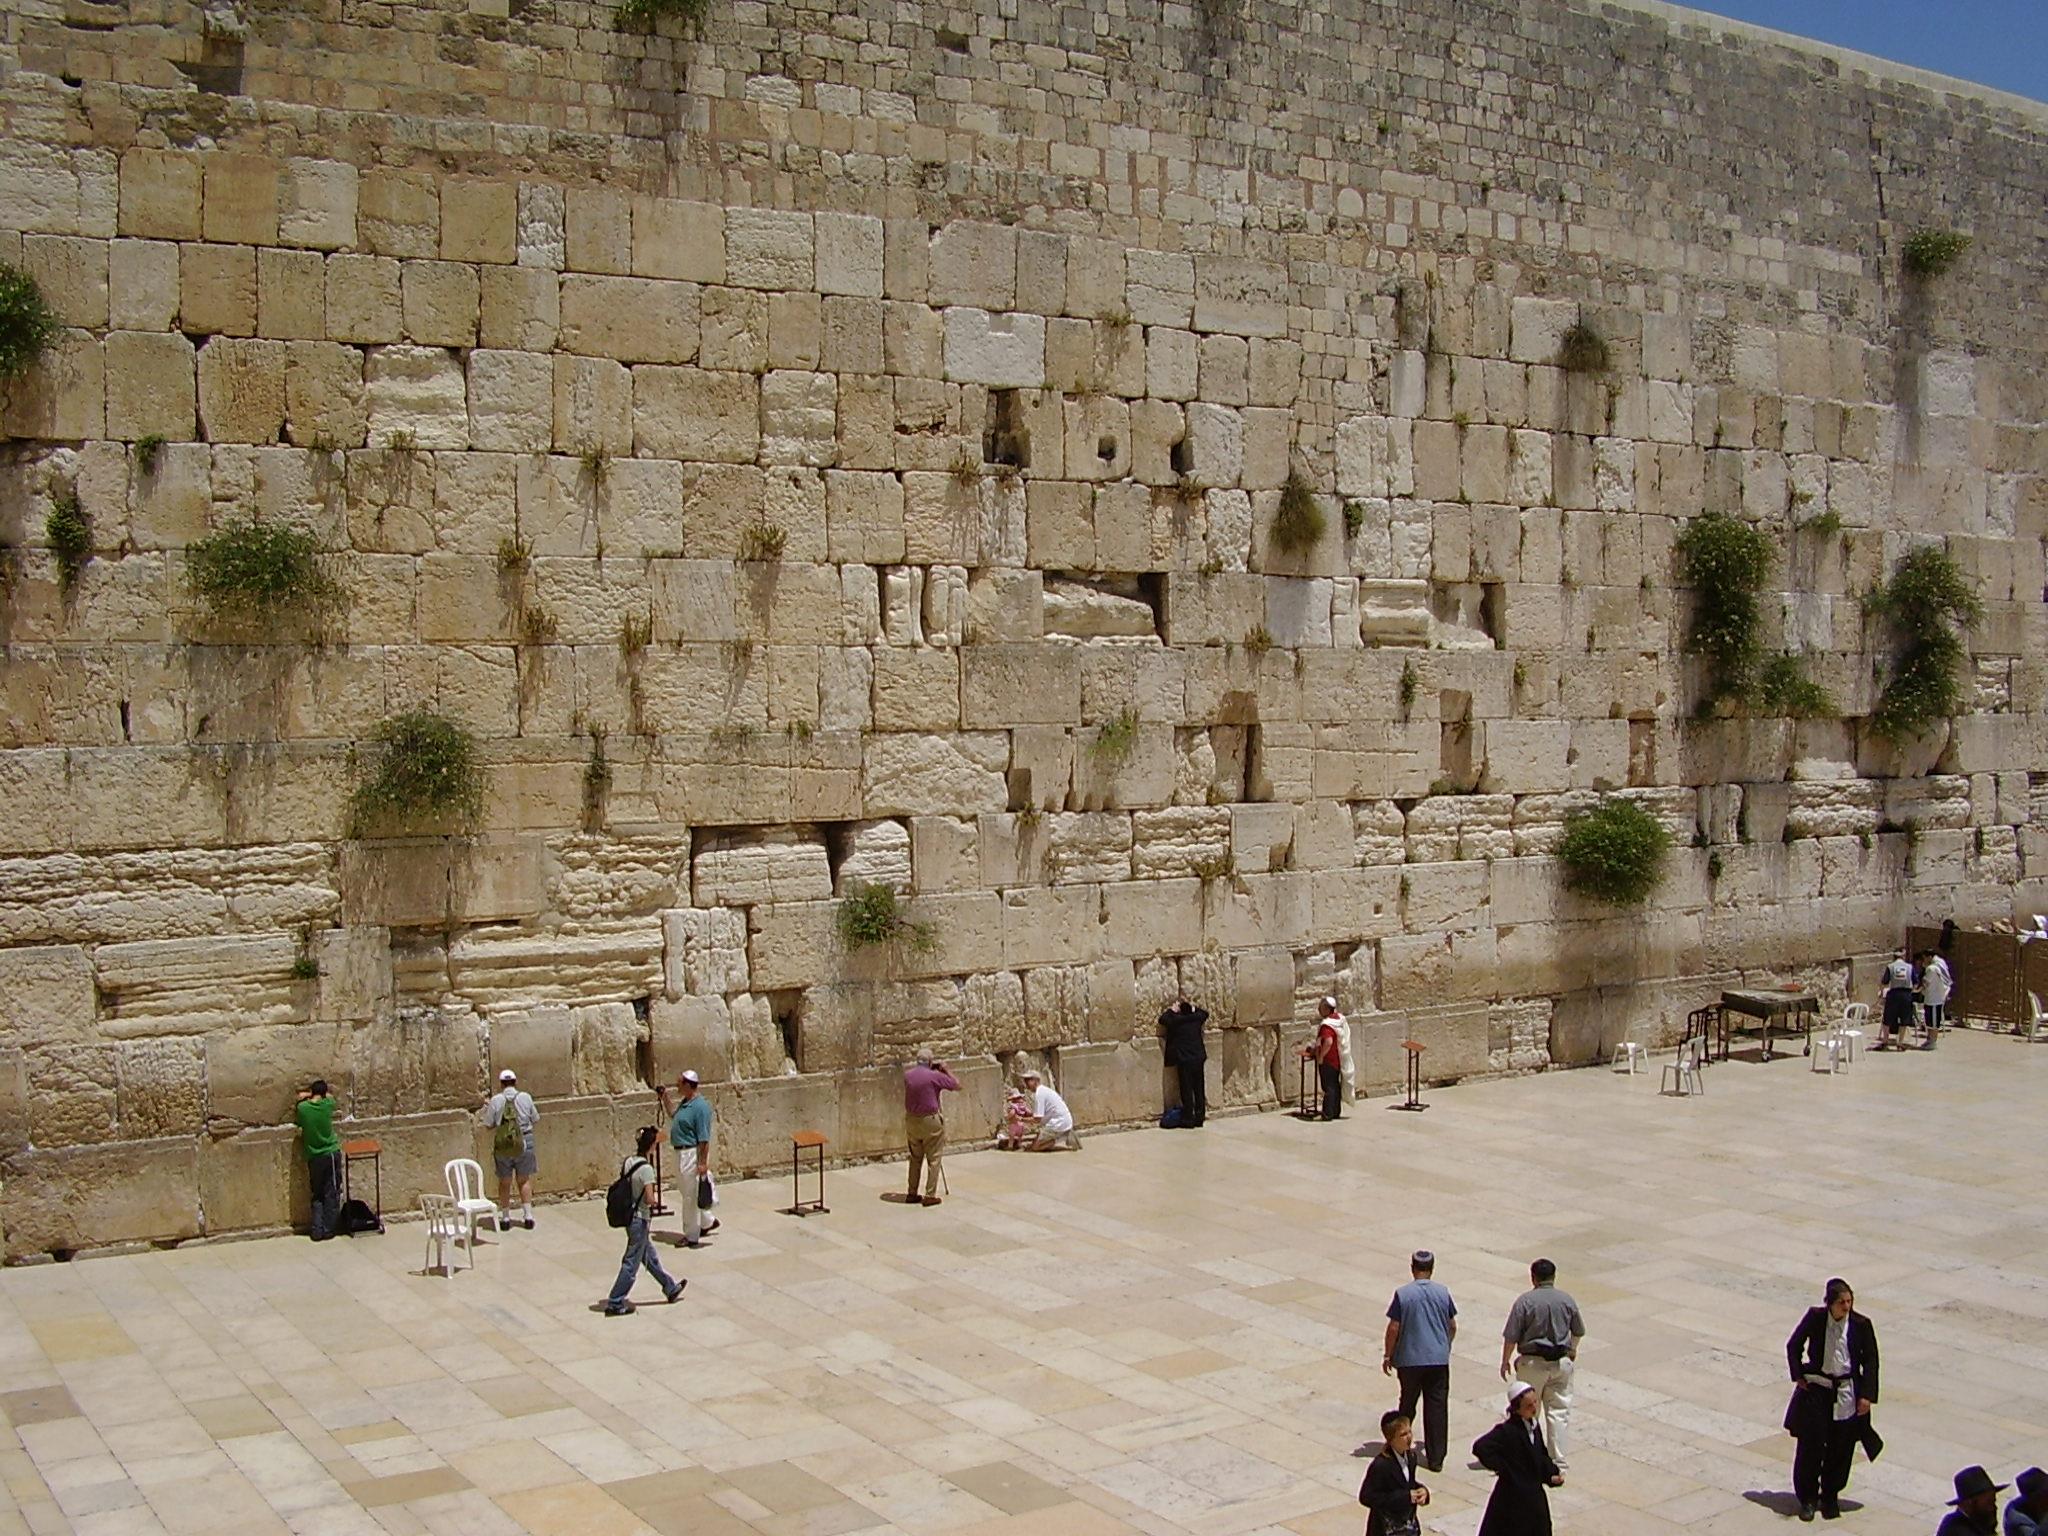 wailing wall jerusalem history check out wailing wall